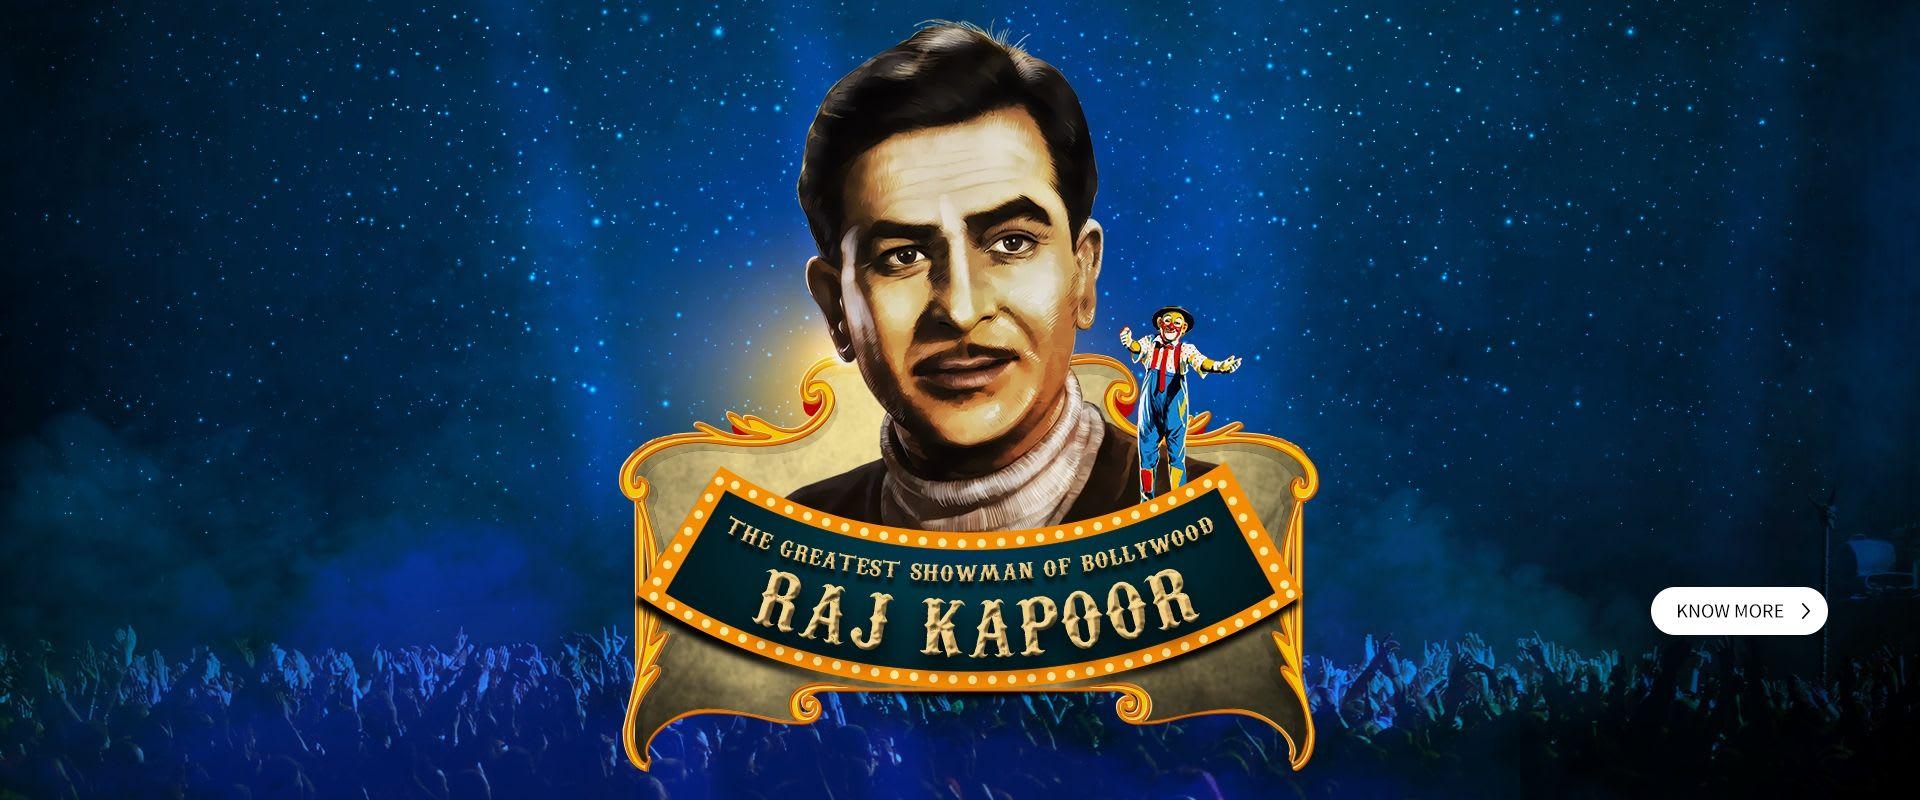 The Greatest Showman of Bollywood - Raj Kapoor